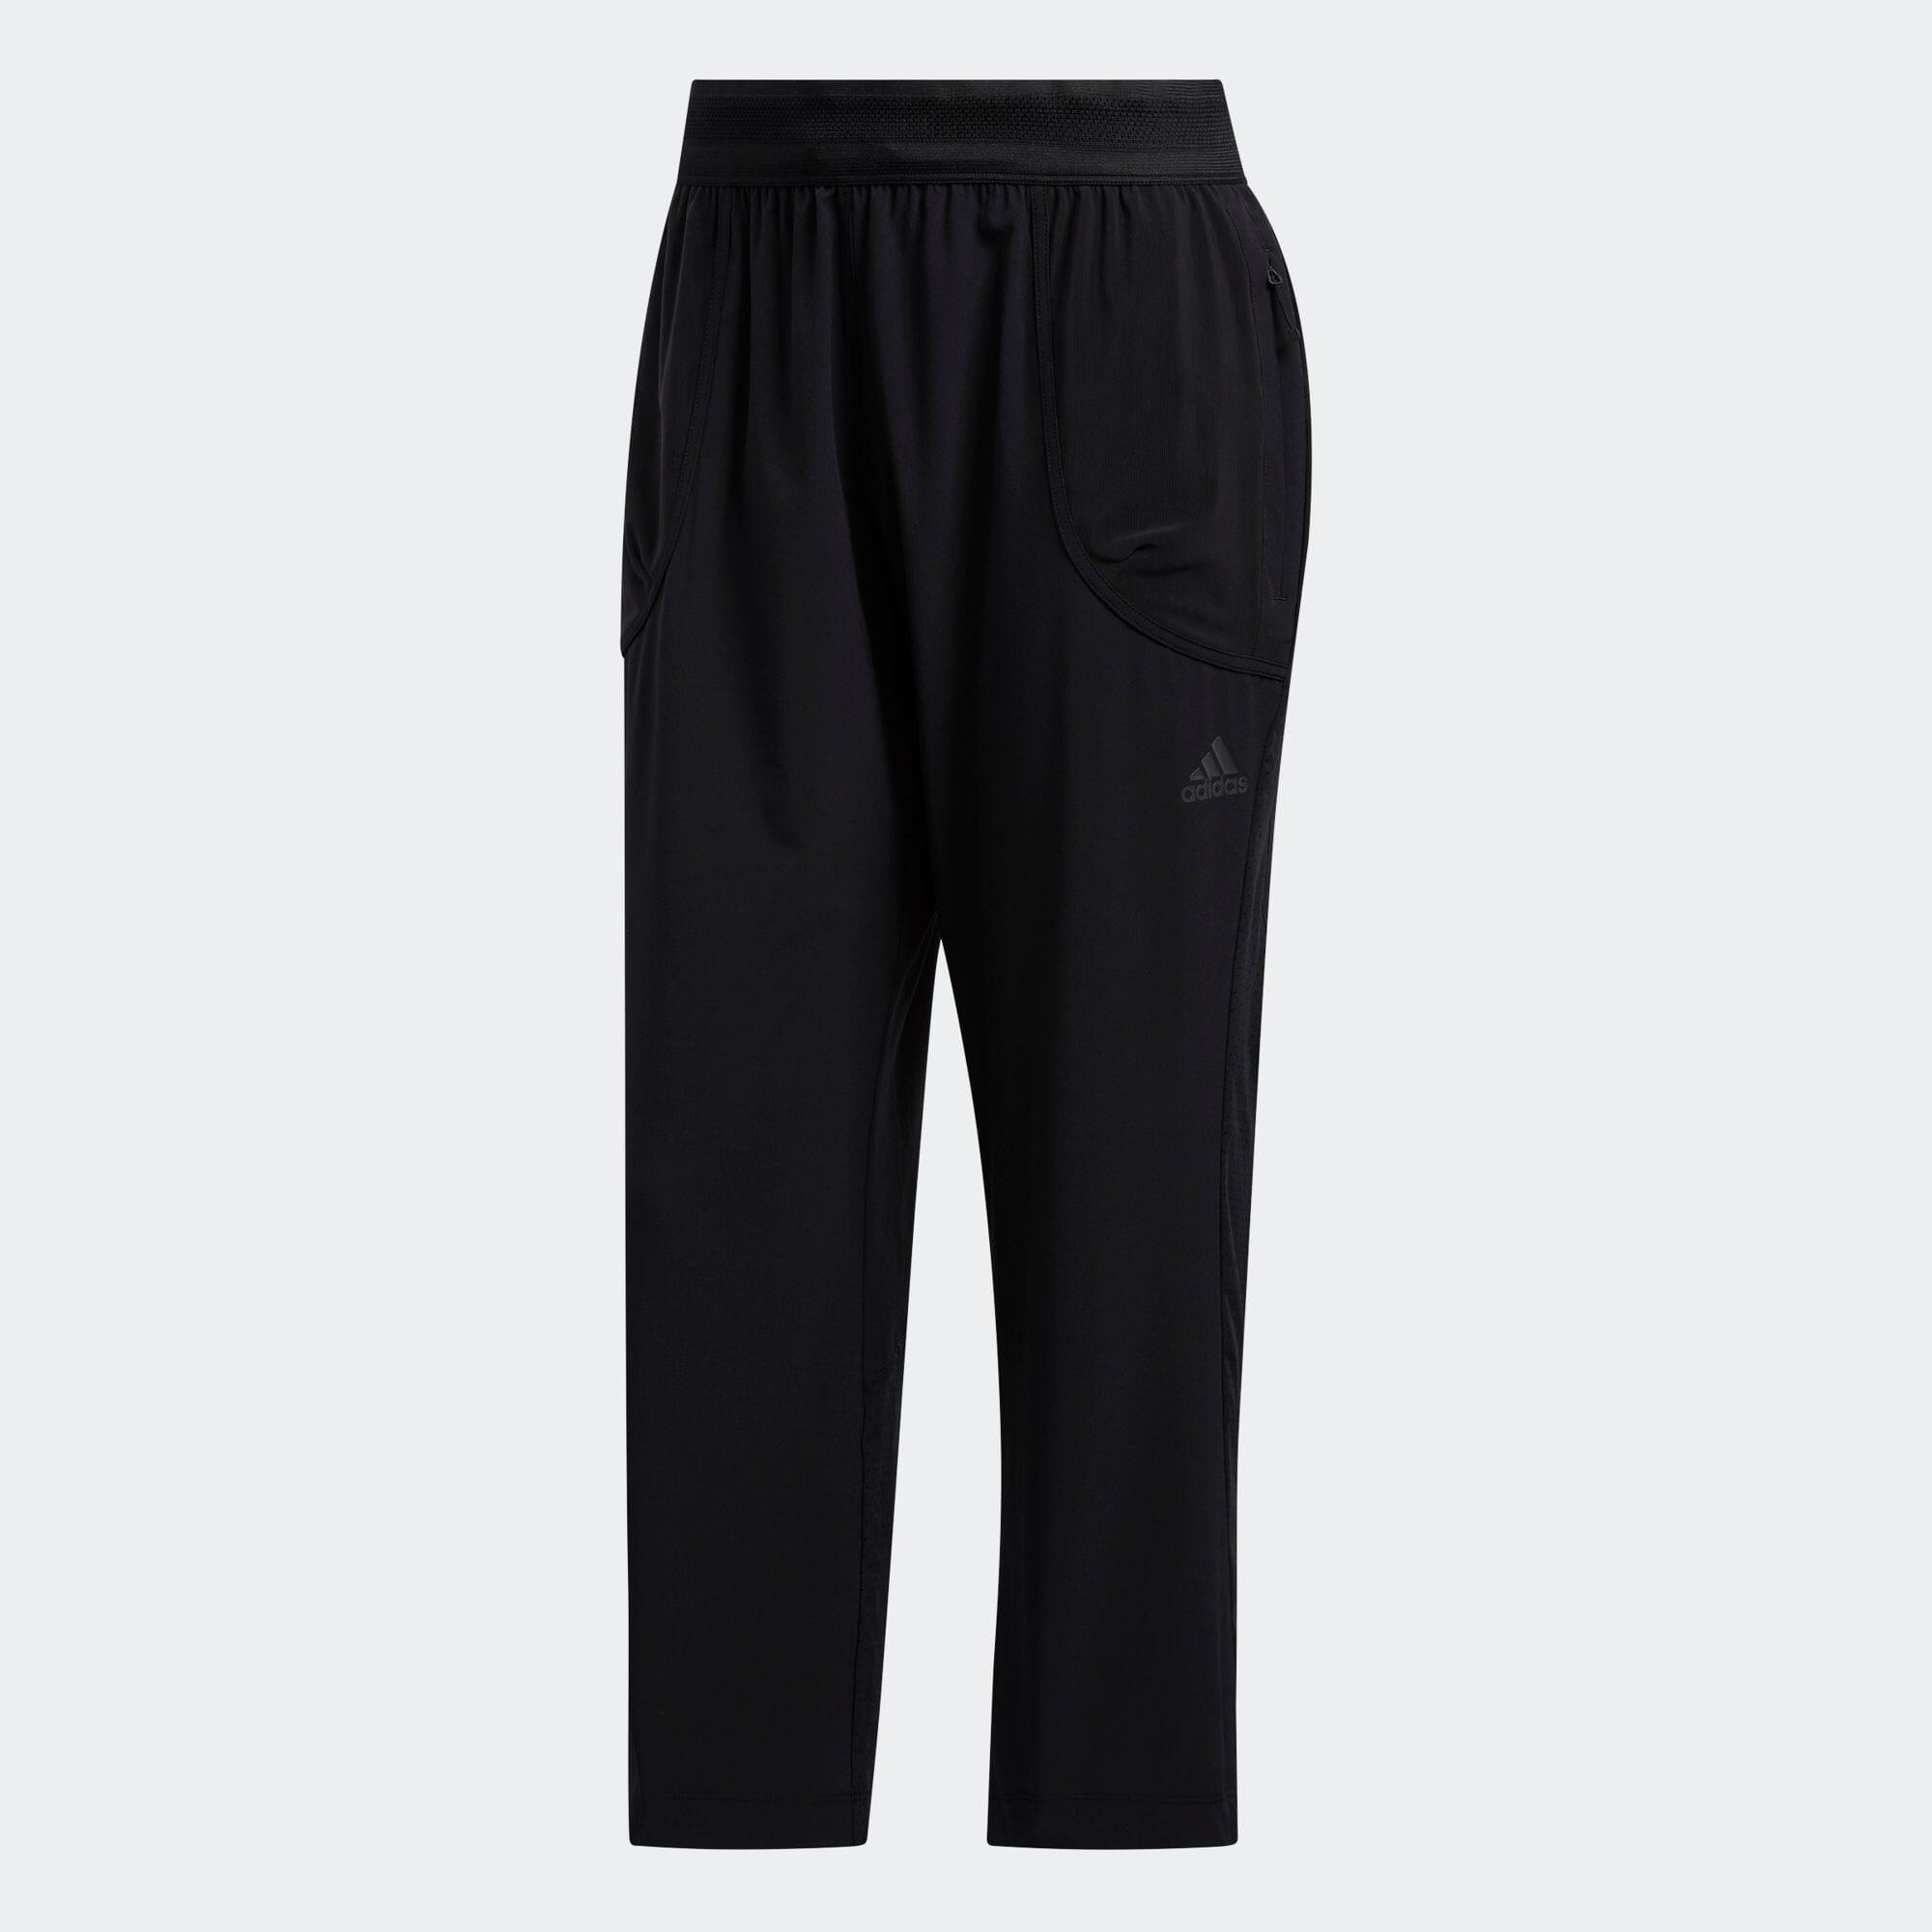 AEROREADY アジャスタブル トレーニングパンツ / AEROREADY Adjustable Training Pants